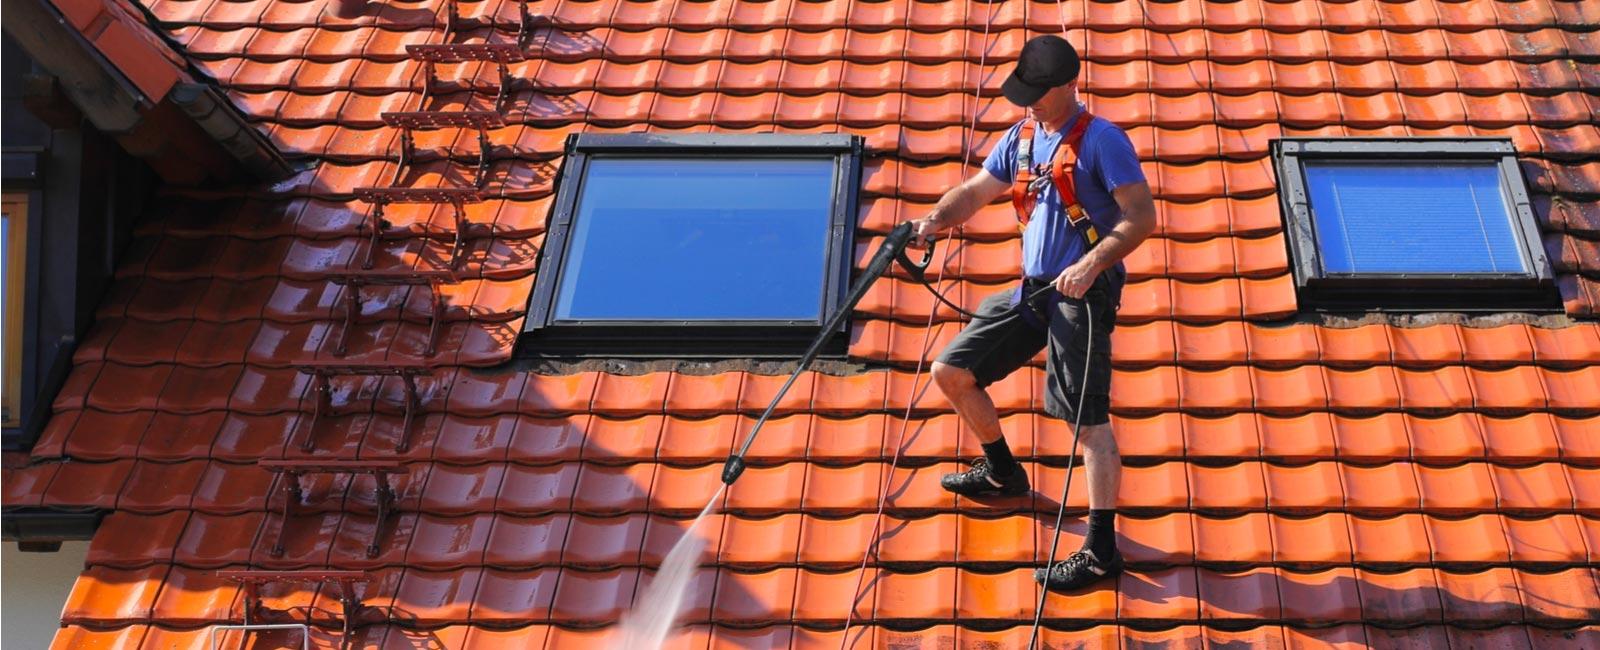 nettoyer sa toiture au printemps